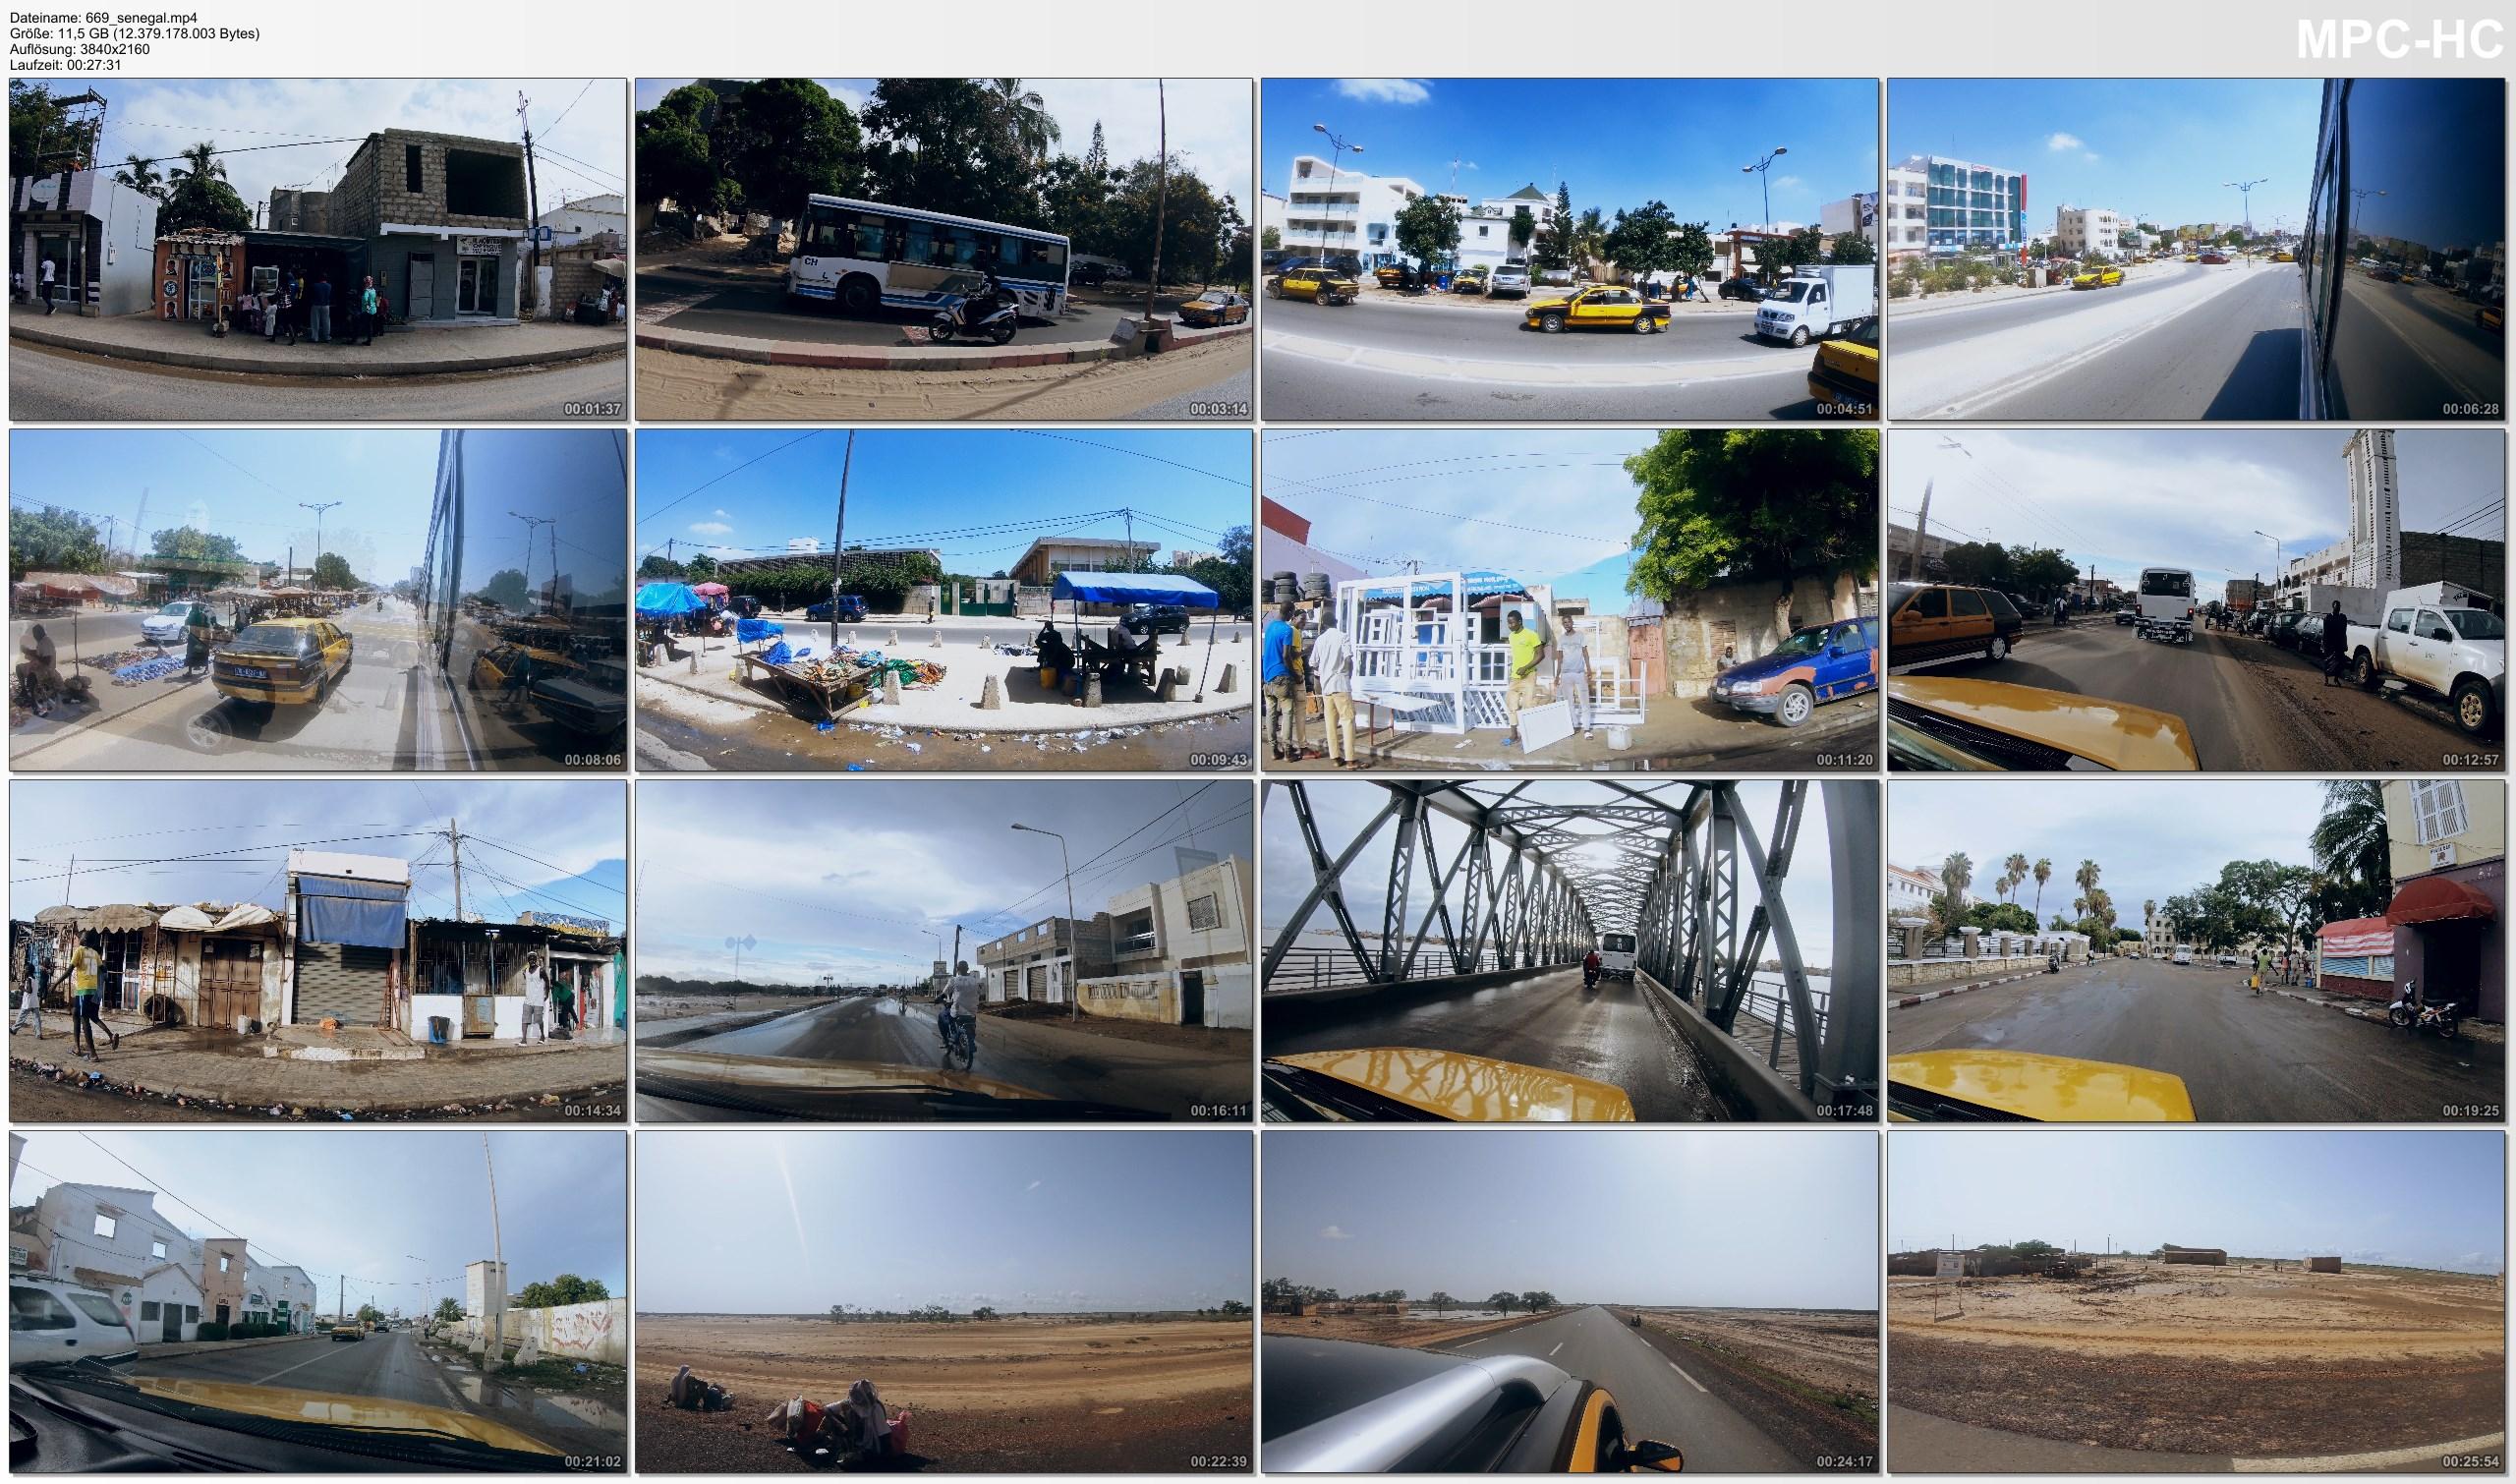 Pictures from Video 【4K】28 MINUTES | Driving Senegal (West Africa) | 2020 | Dakar | Saint-Louis | UltraHD Travel Video